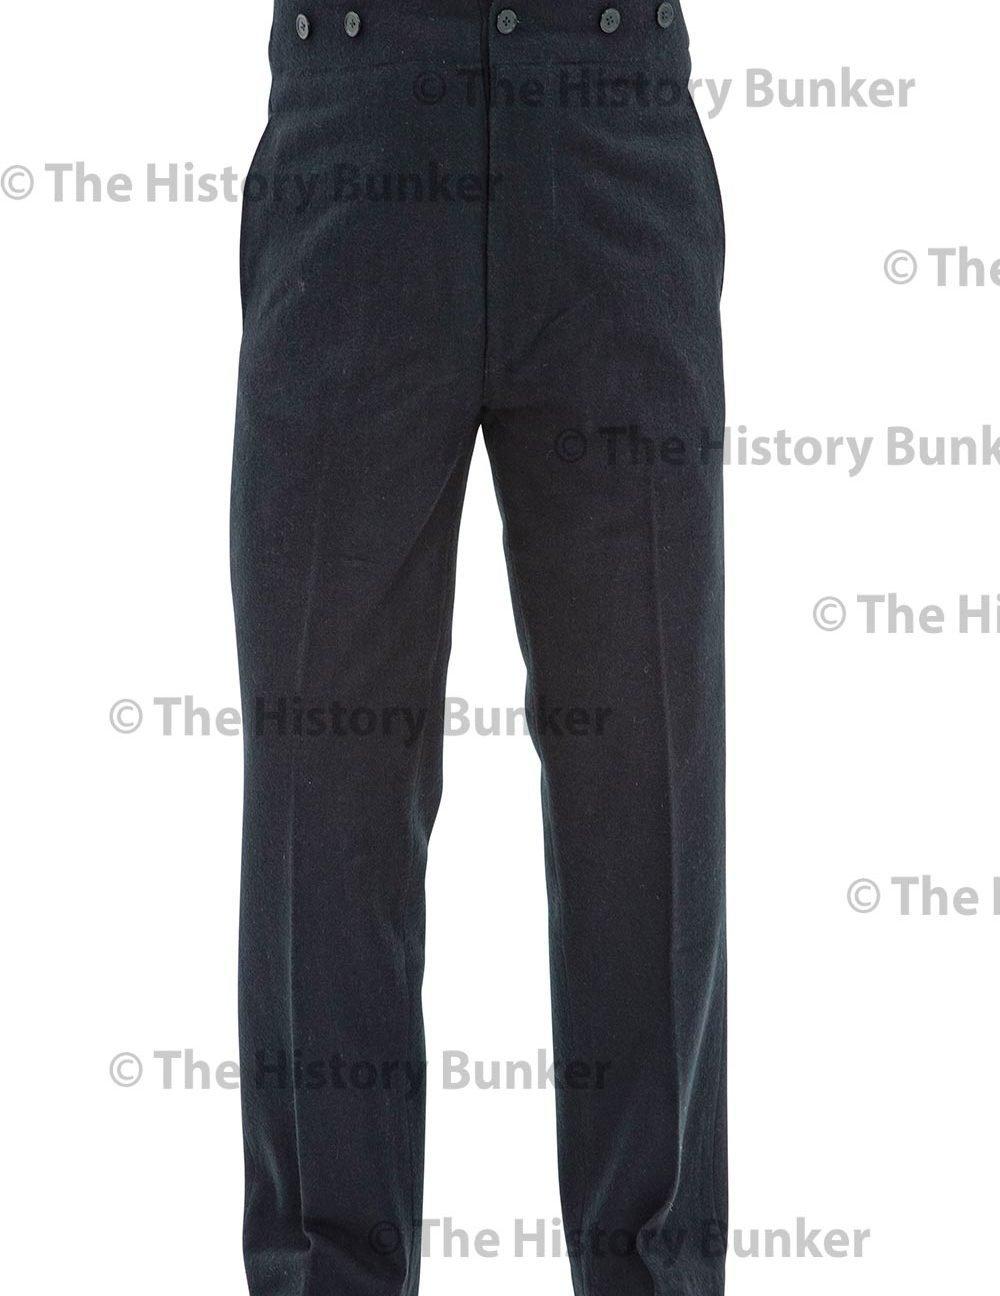 Royal Irish Constabulary Police trousers